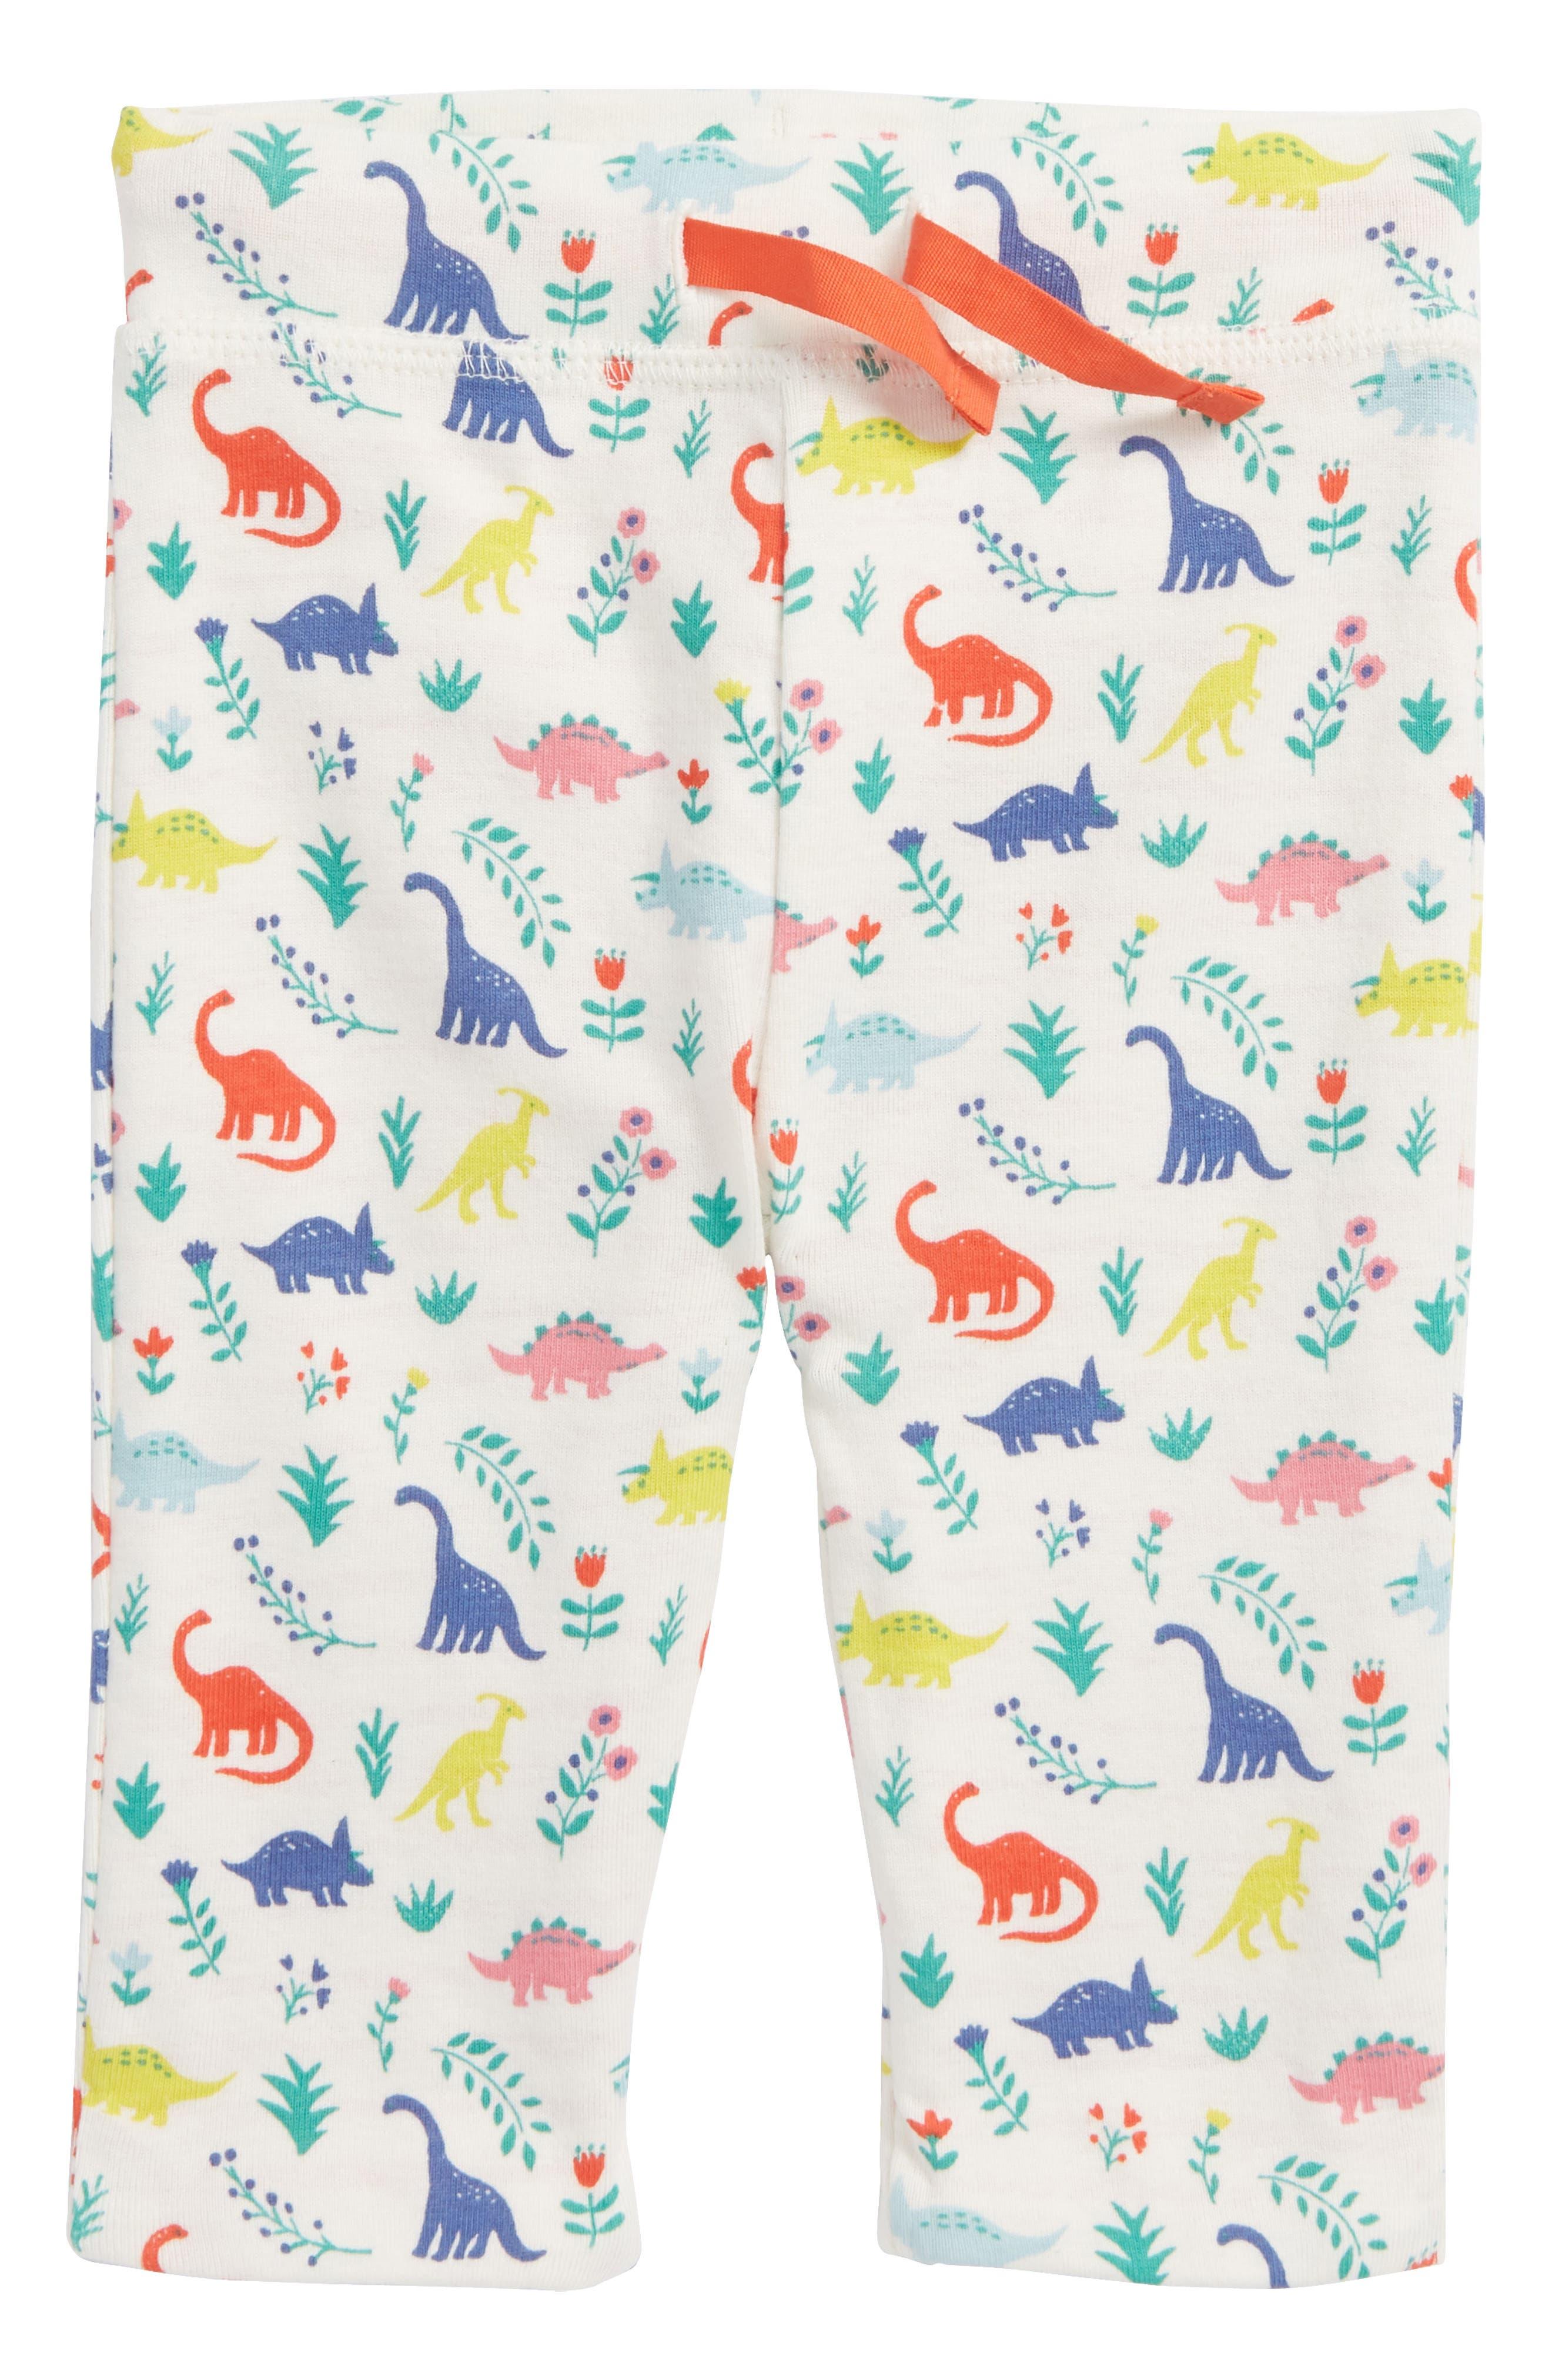 Reversible Print Pants,                             Main thumbnail 1, color,                             Multi Dino Floral